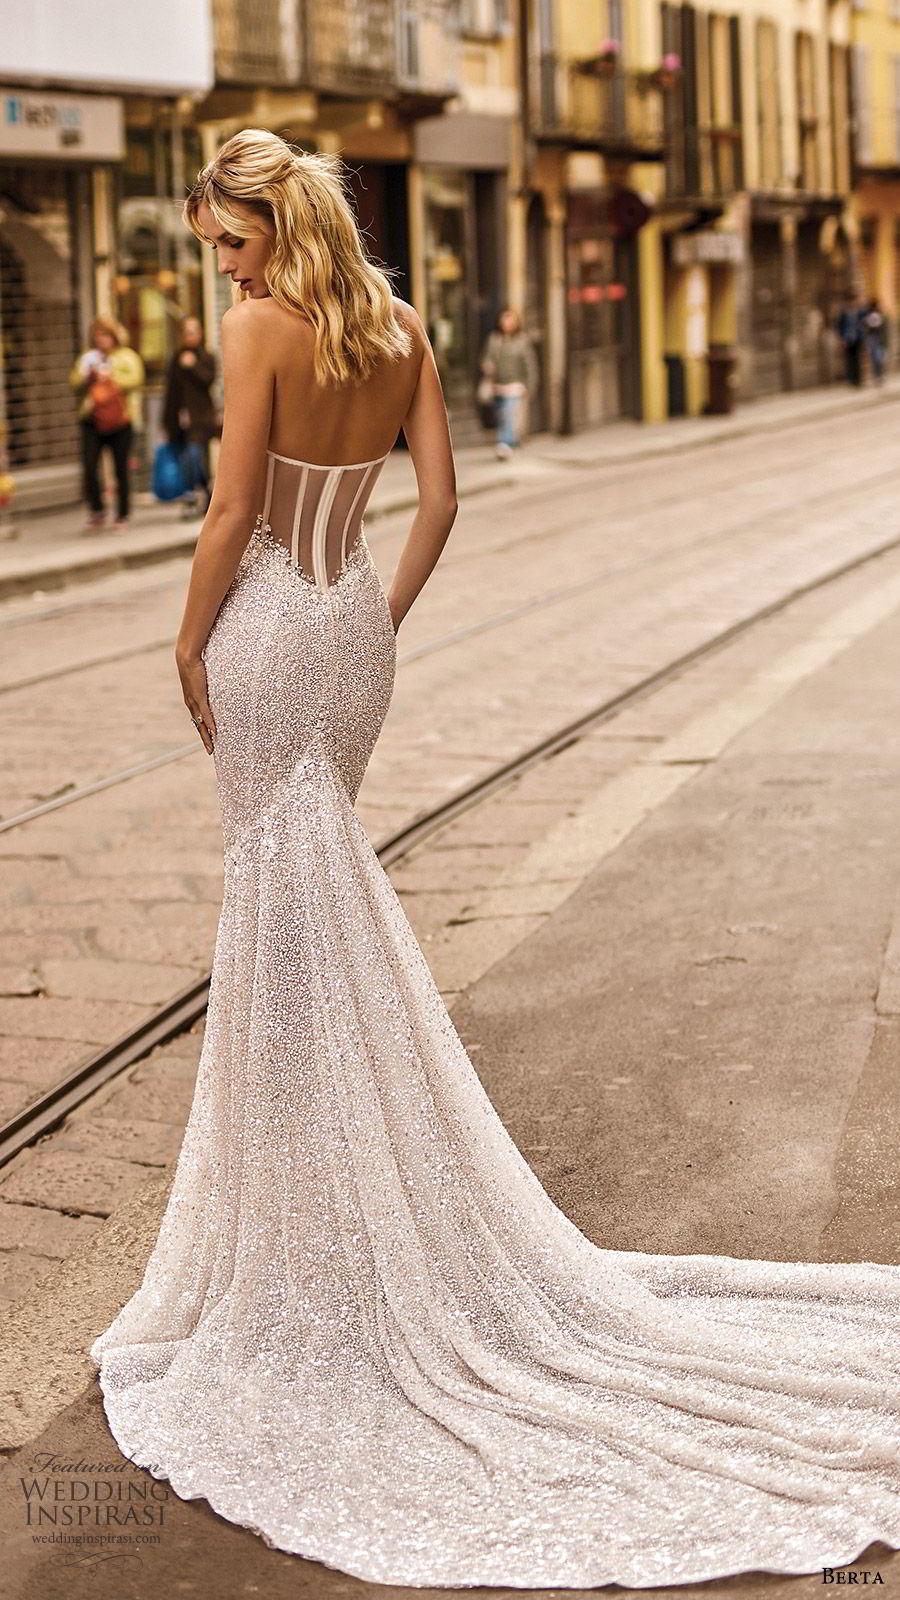 berta spring 2020 bridal strapless sweetheart fully embellished mermaid sheath wedding dress (16) glitzy elegant sheer back chapel train bv